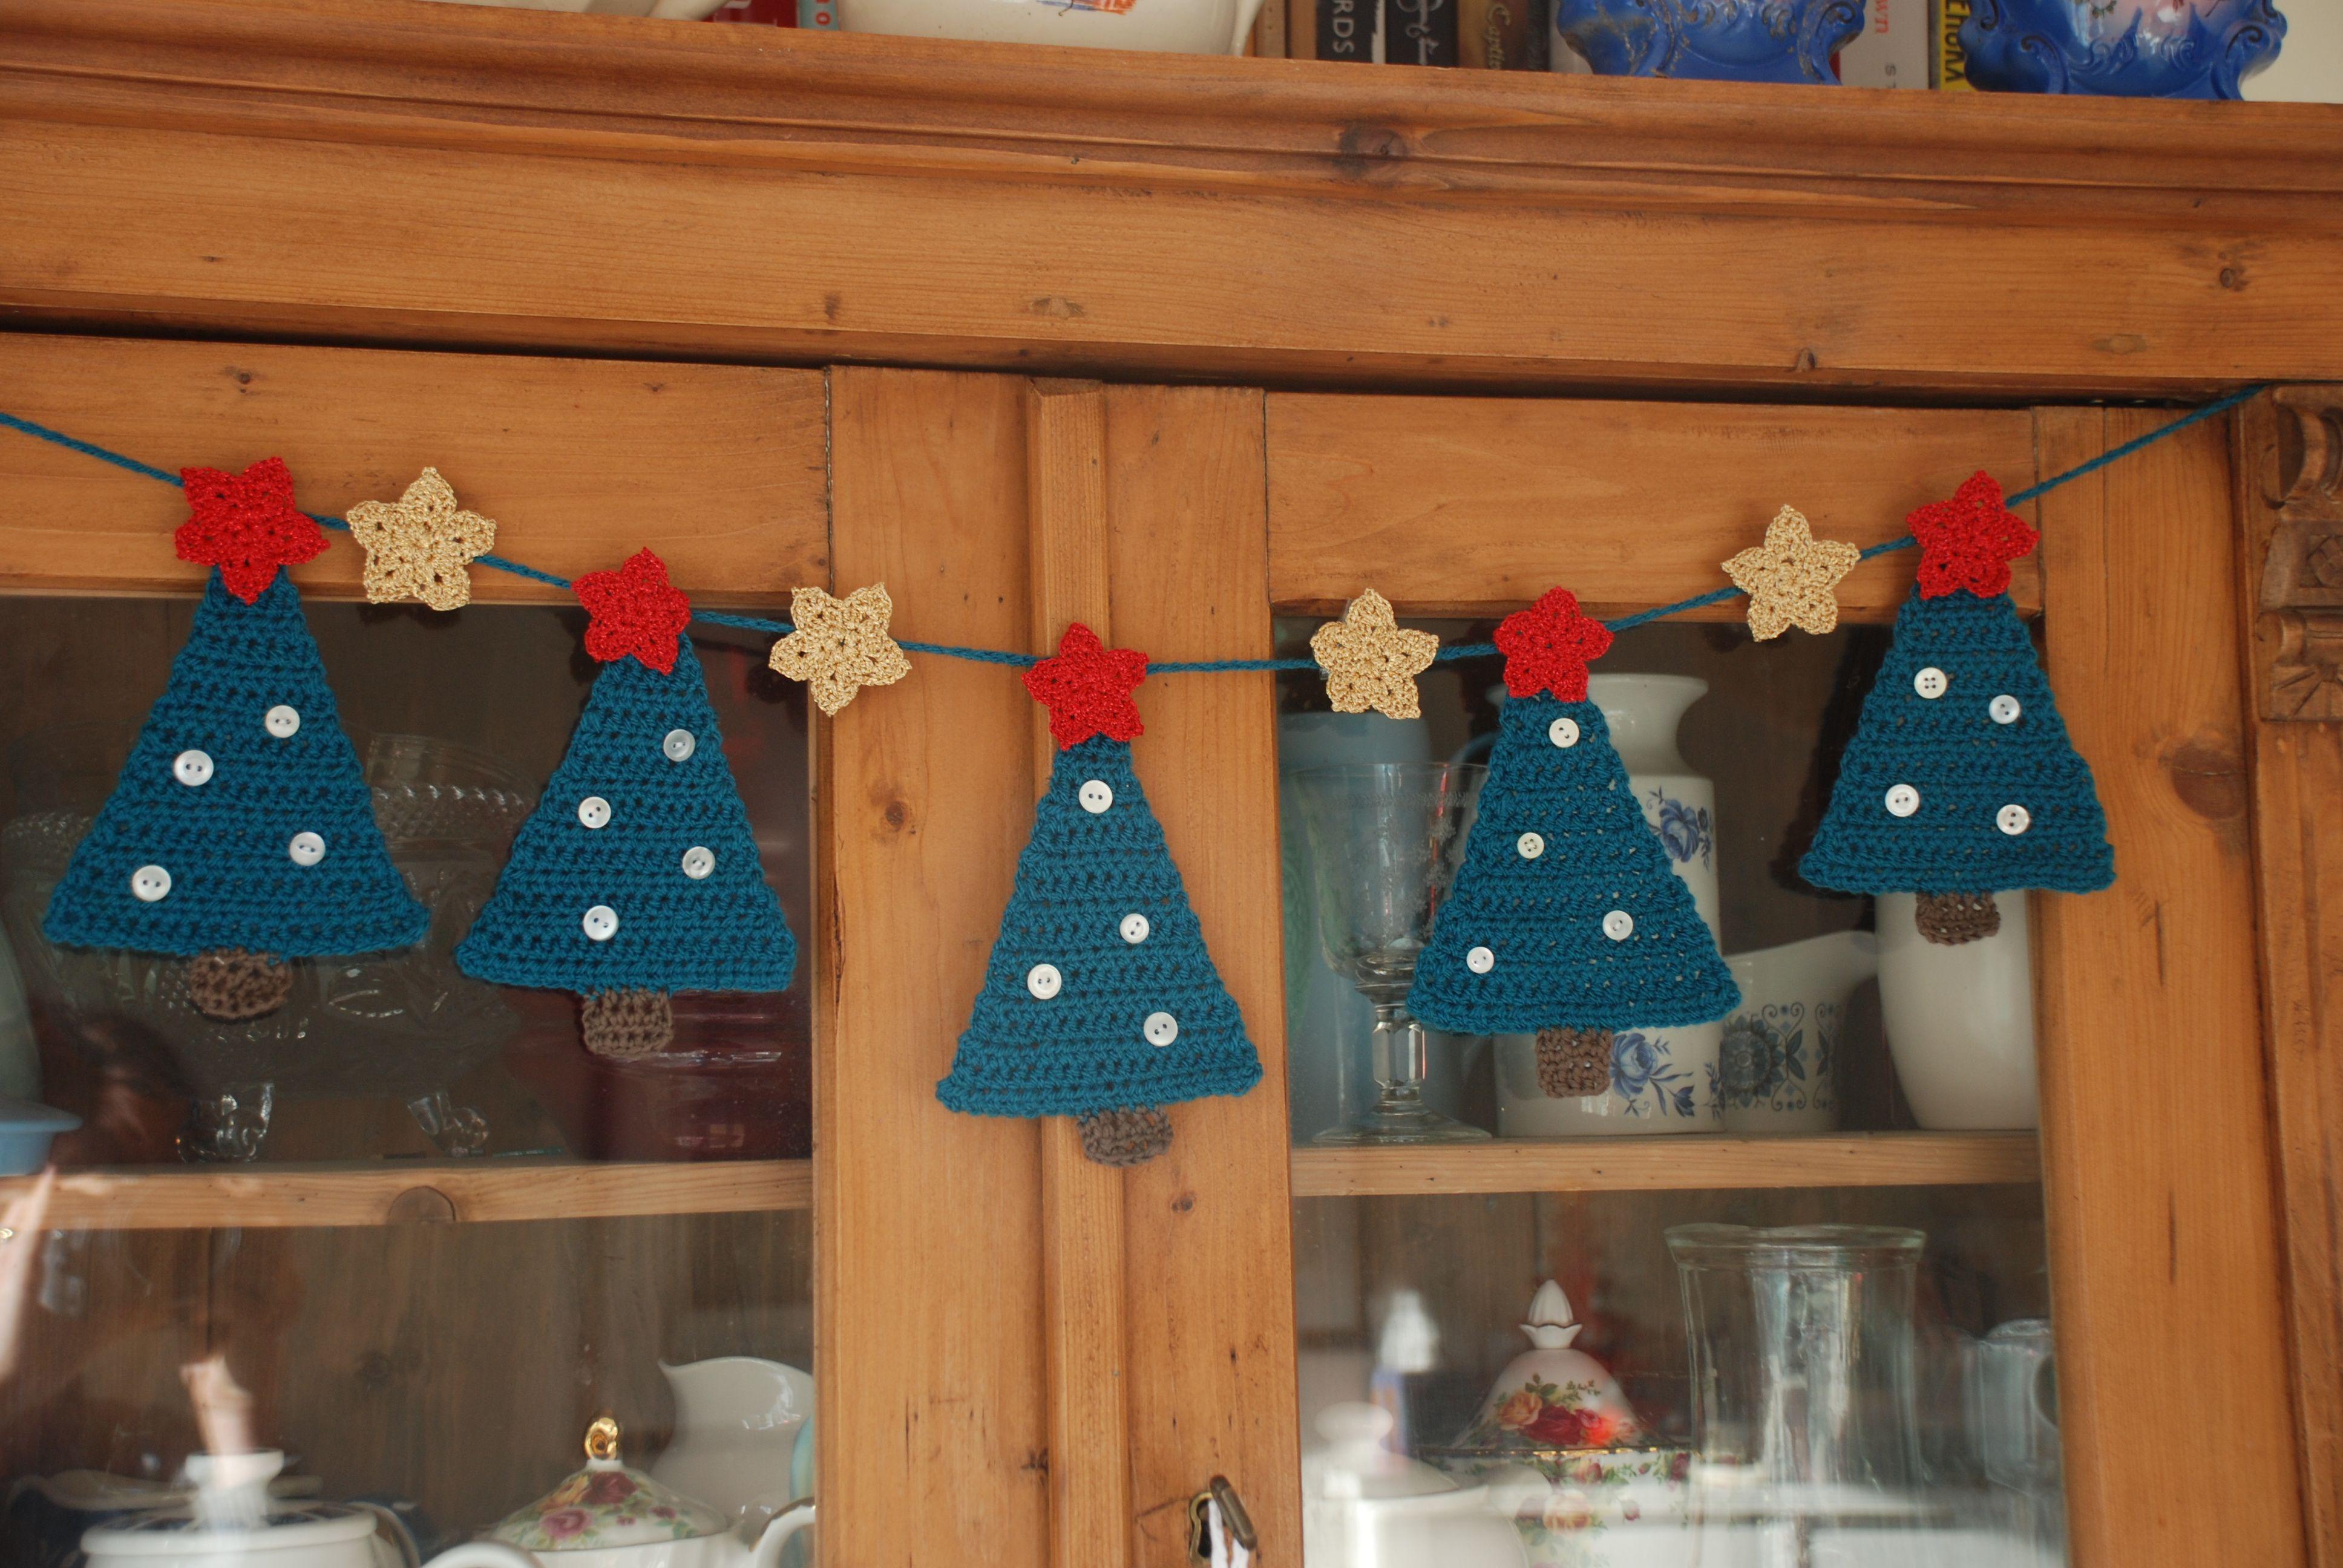 Crochet Christmas Tree Bunting - free pattern